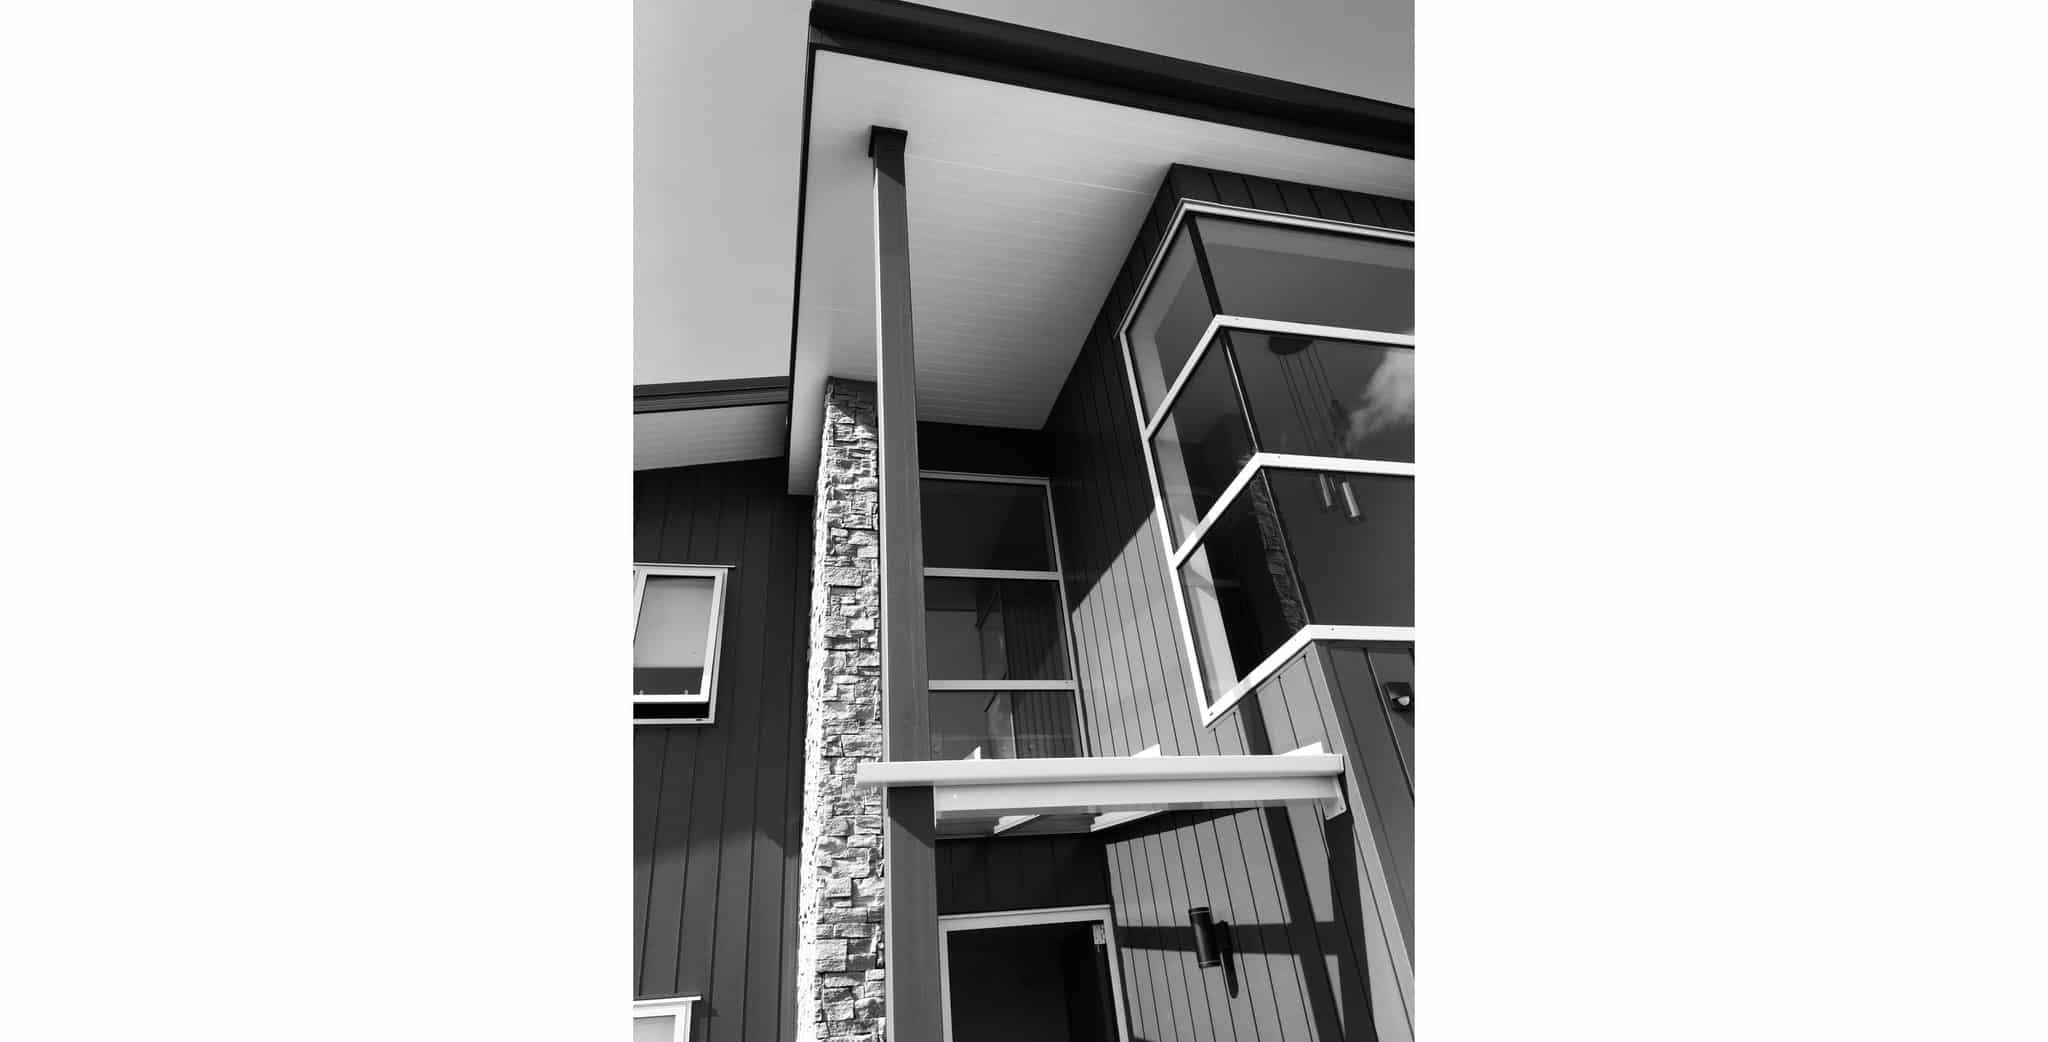 Maraetai House - Exterior b&w 3